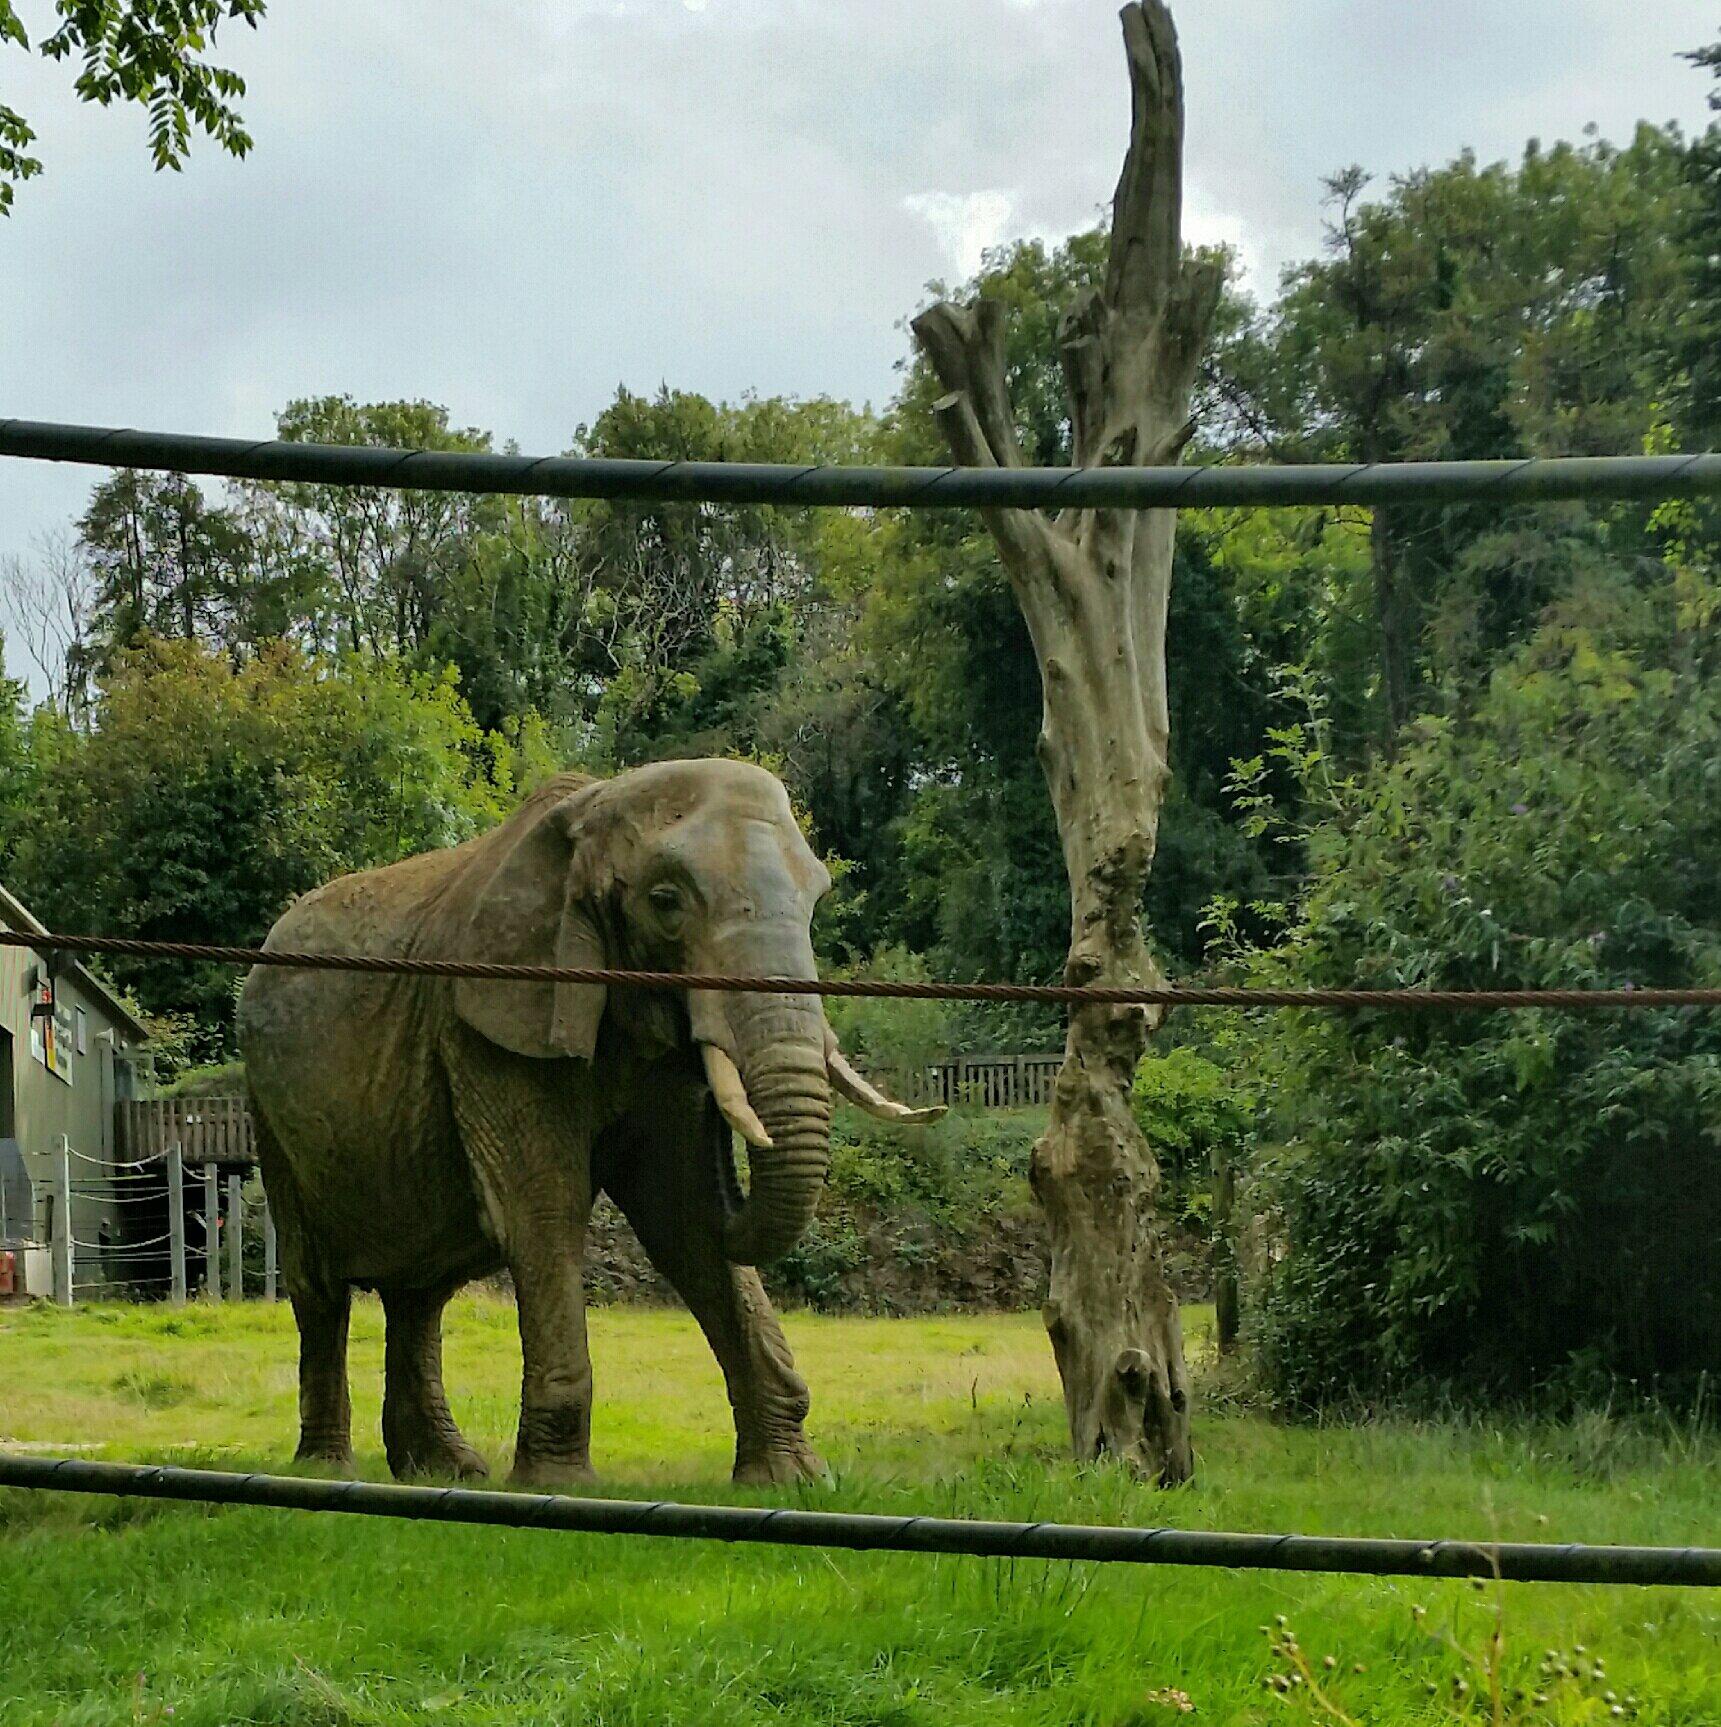 An elephant photograph for December 4th online advent calendar